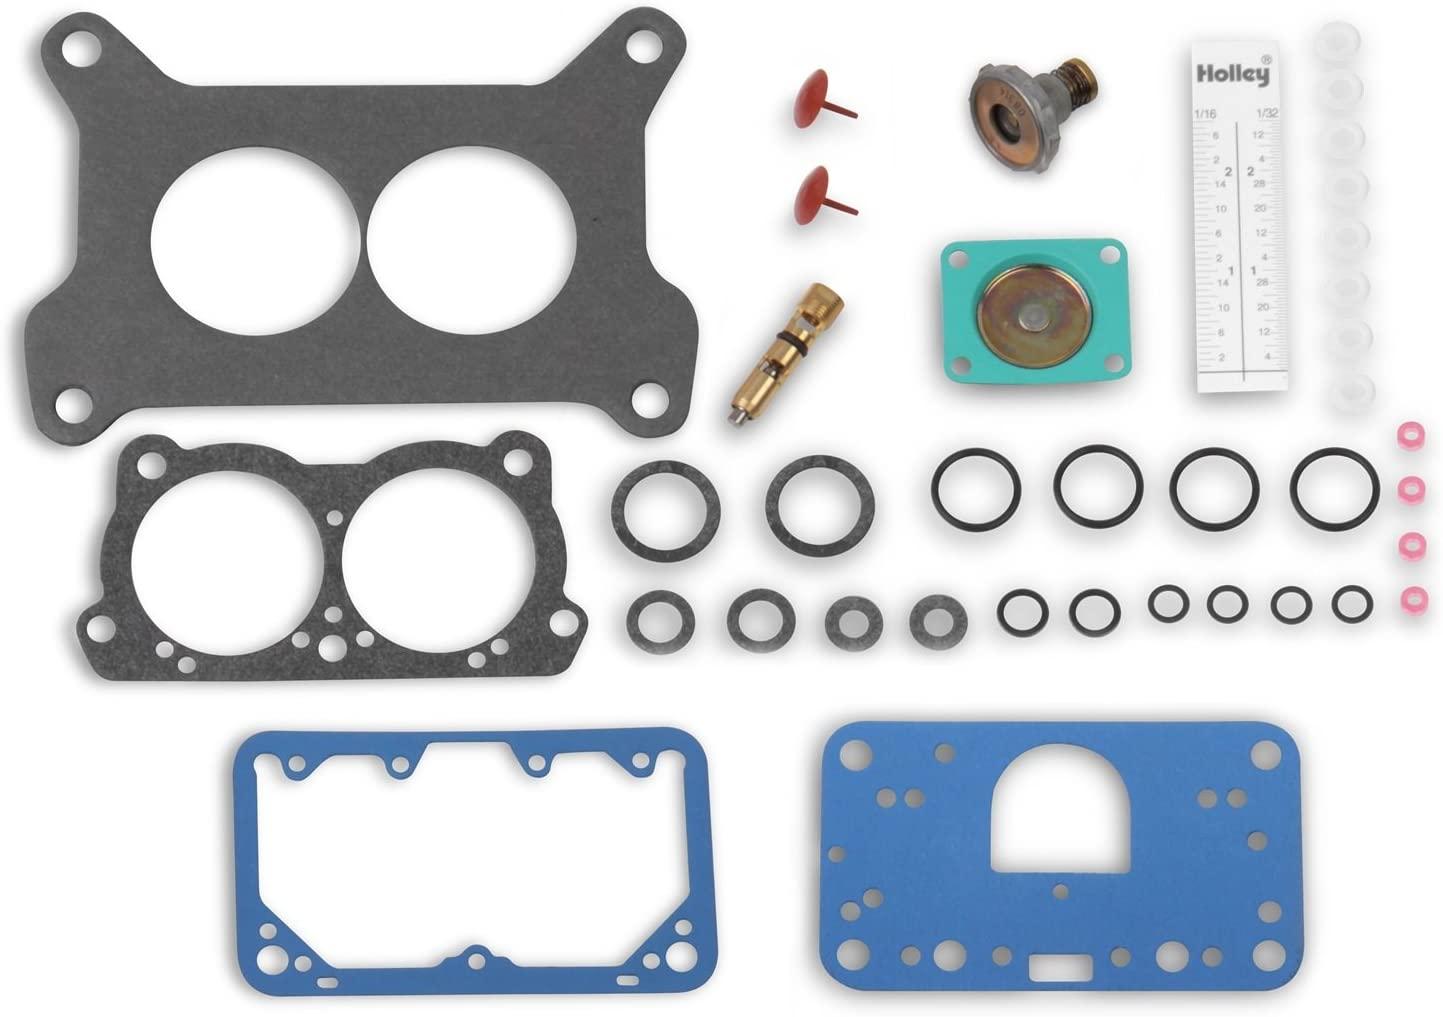 Holley 37-1550 Ultra HP Carburetor Kit